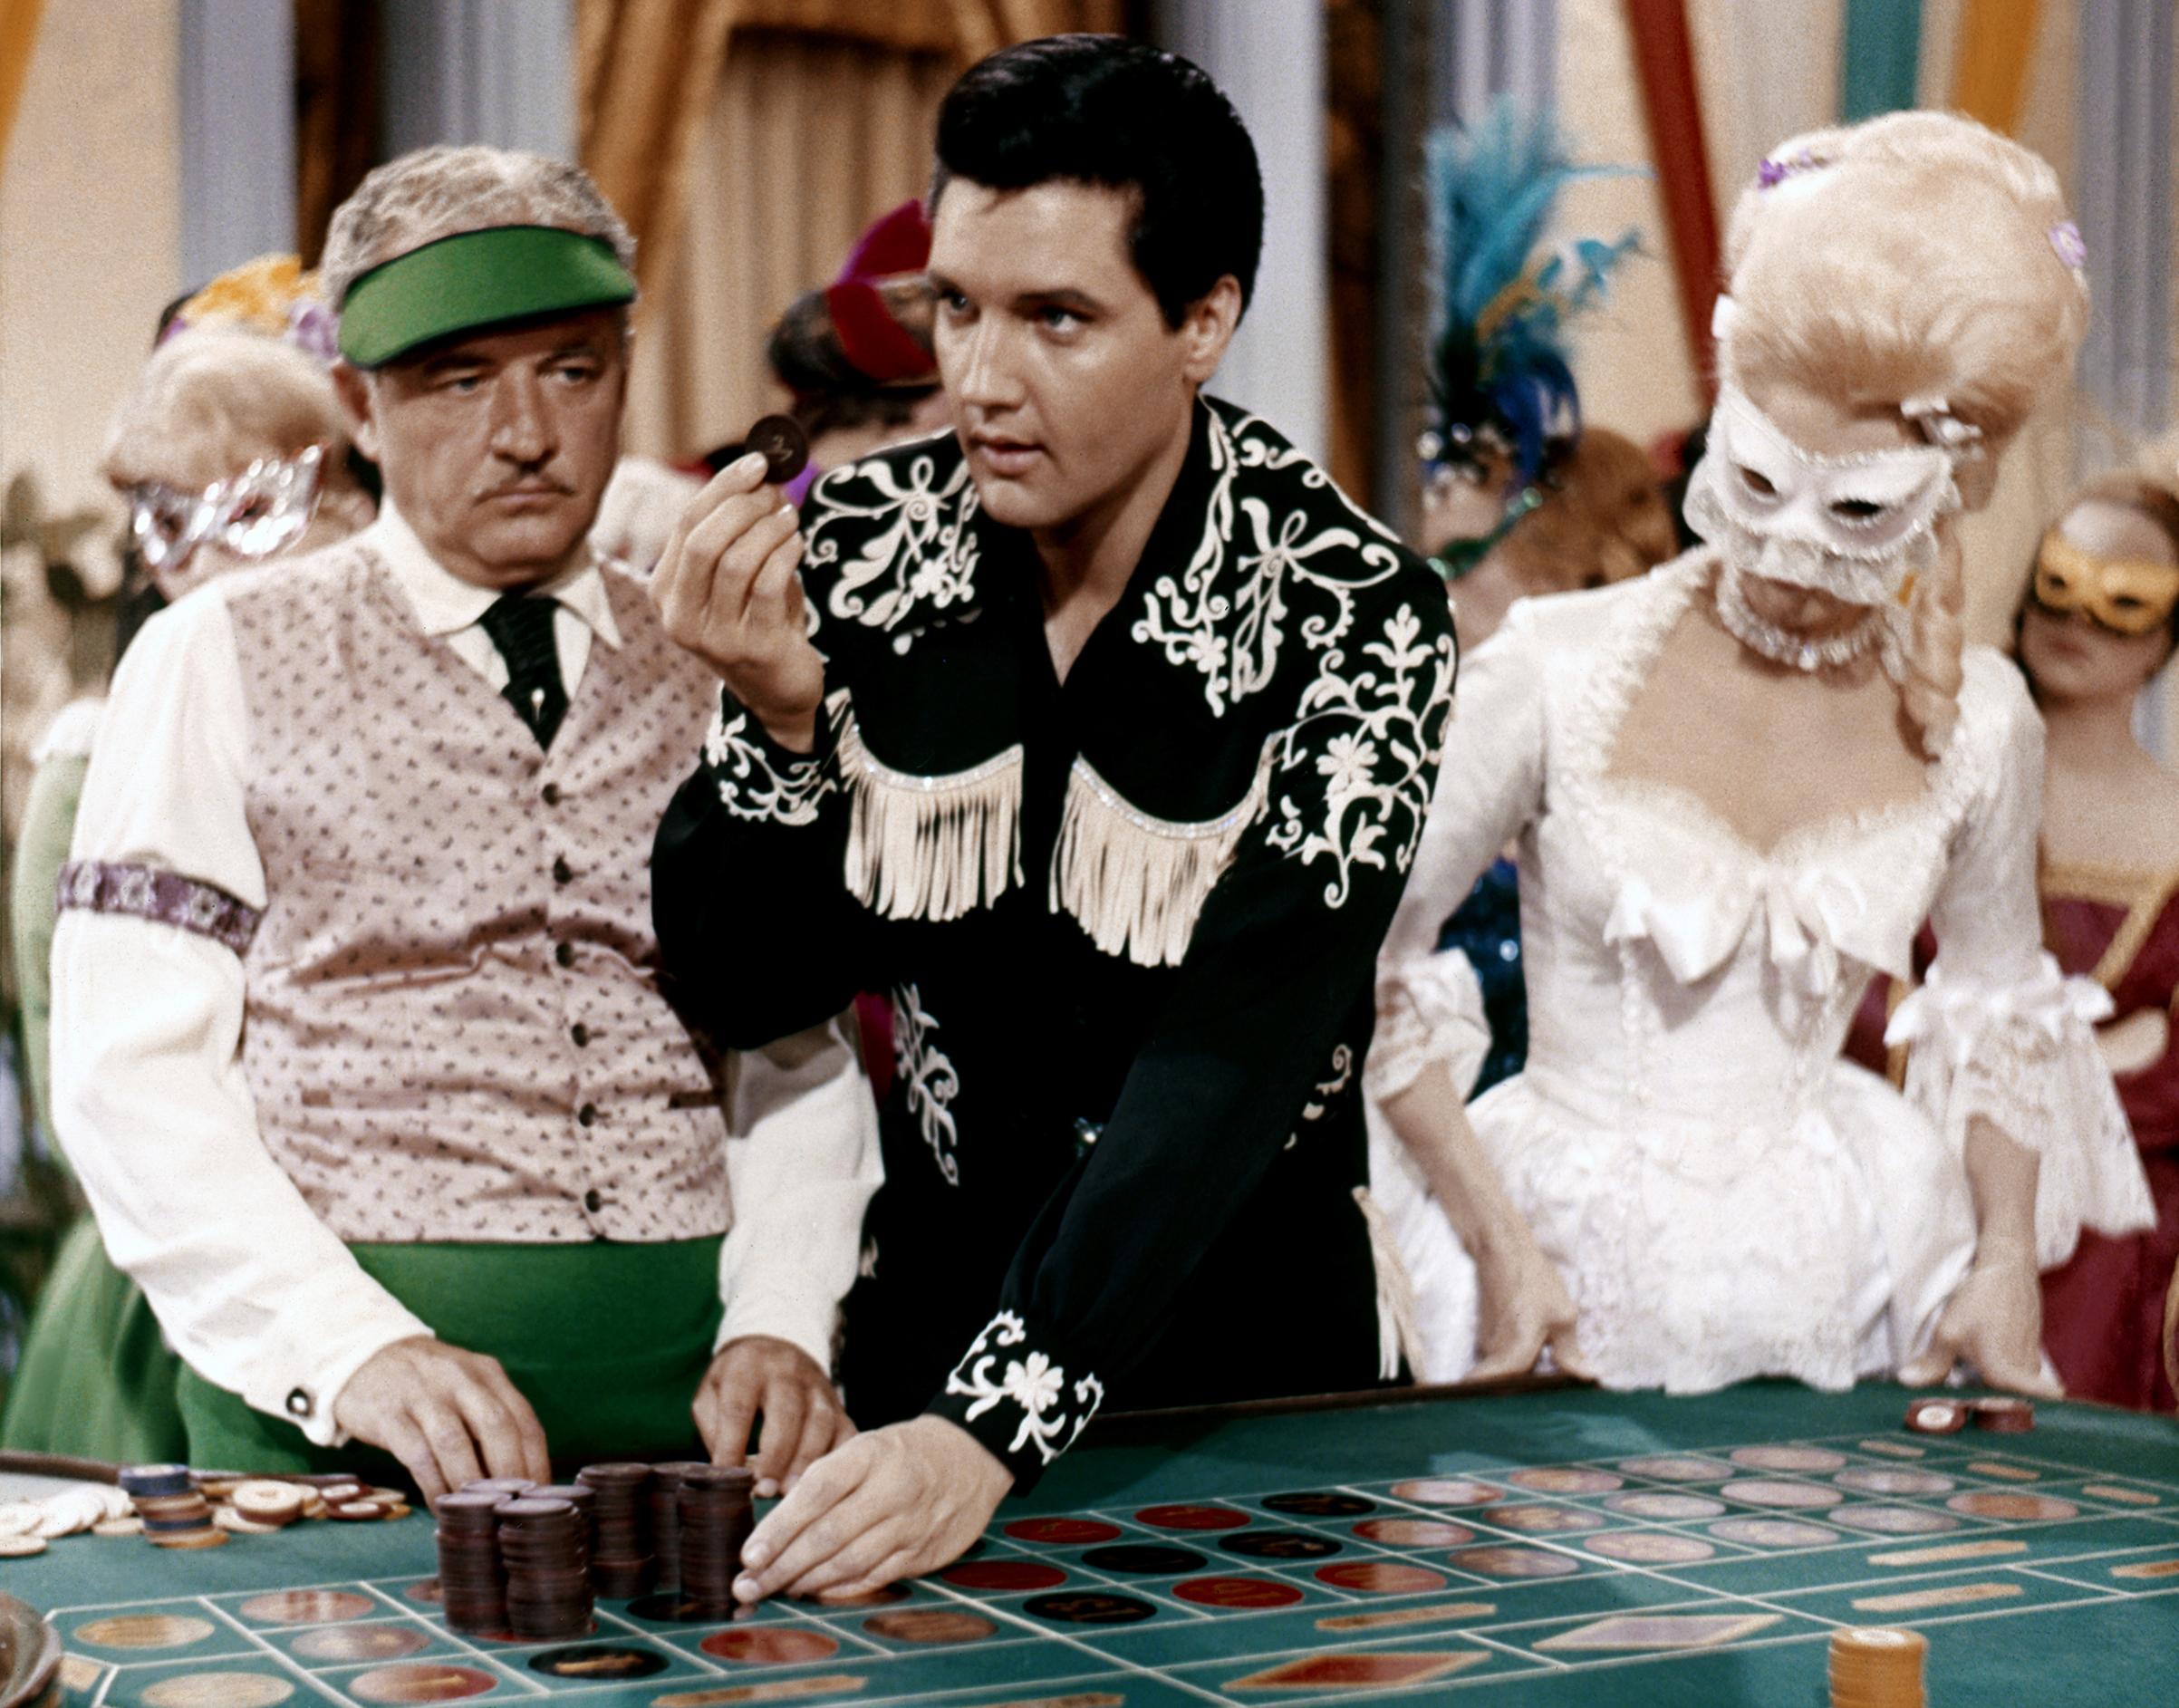 Frankie and Johnny :                                1966, Elvis in a casino scene.